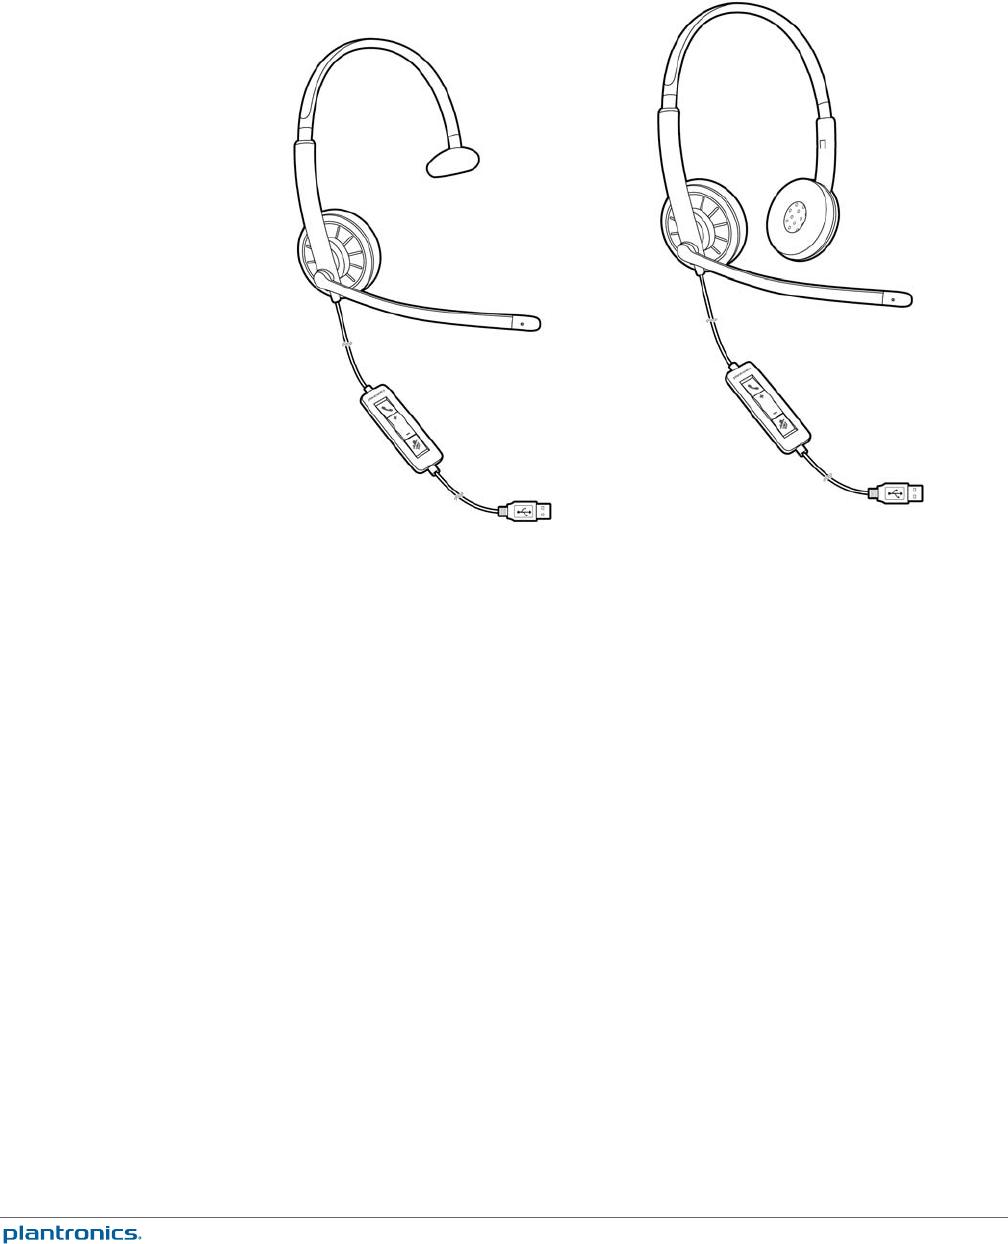 Plantronics Blackwire C310M/C320M USB Corded Headset User